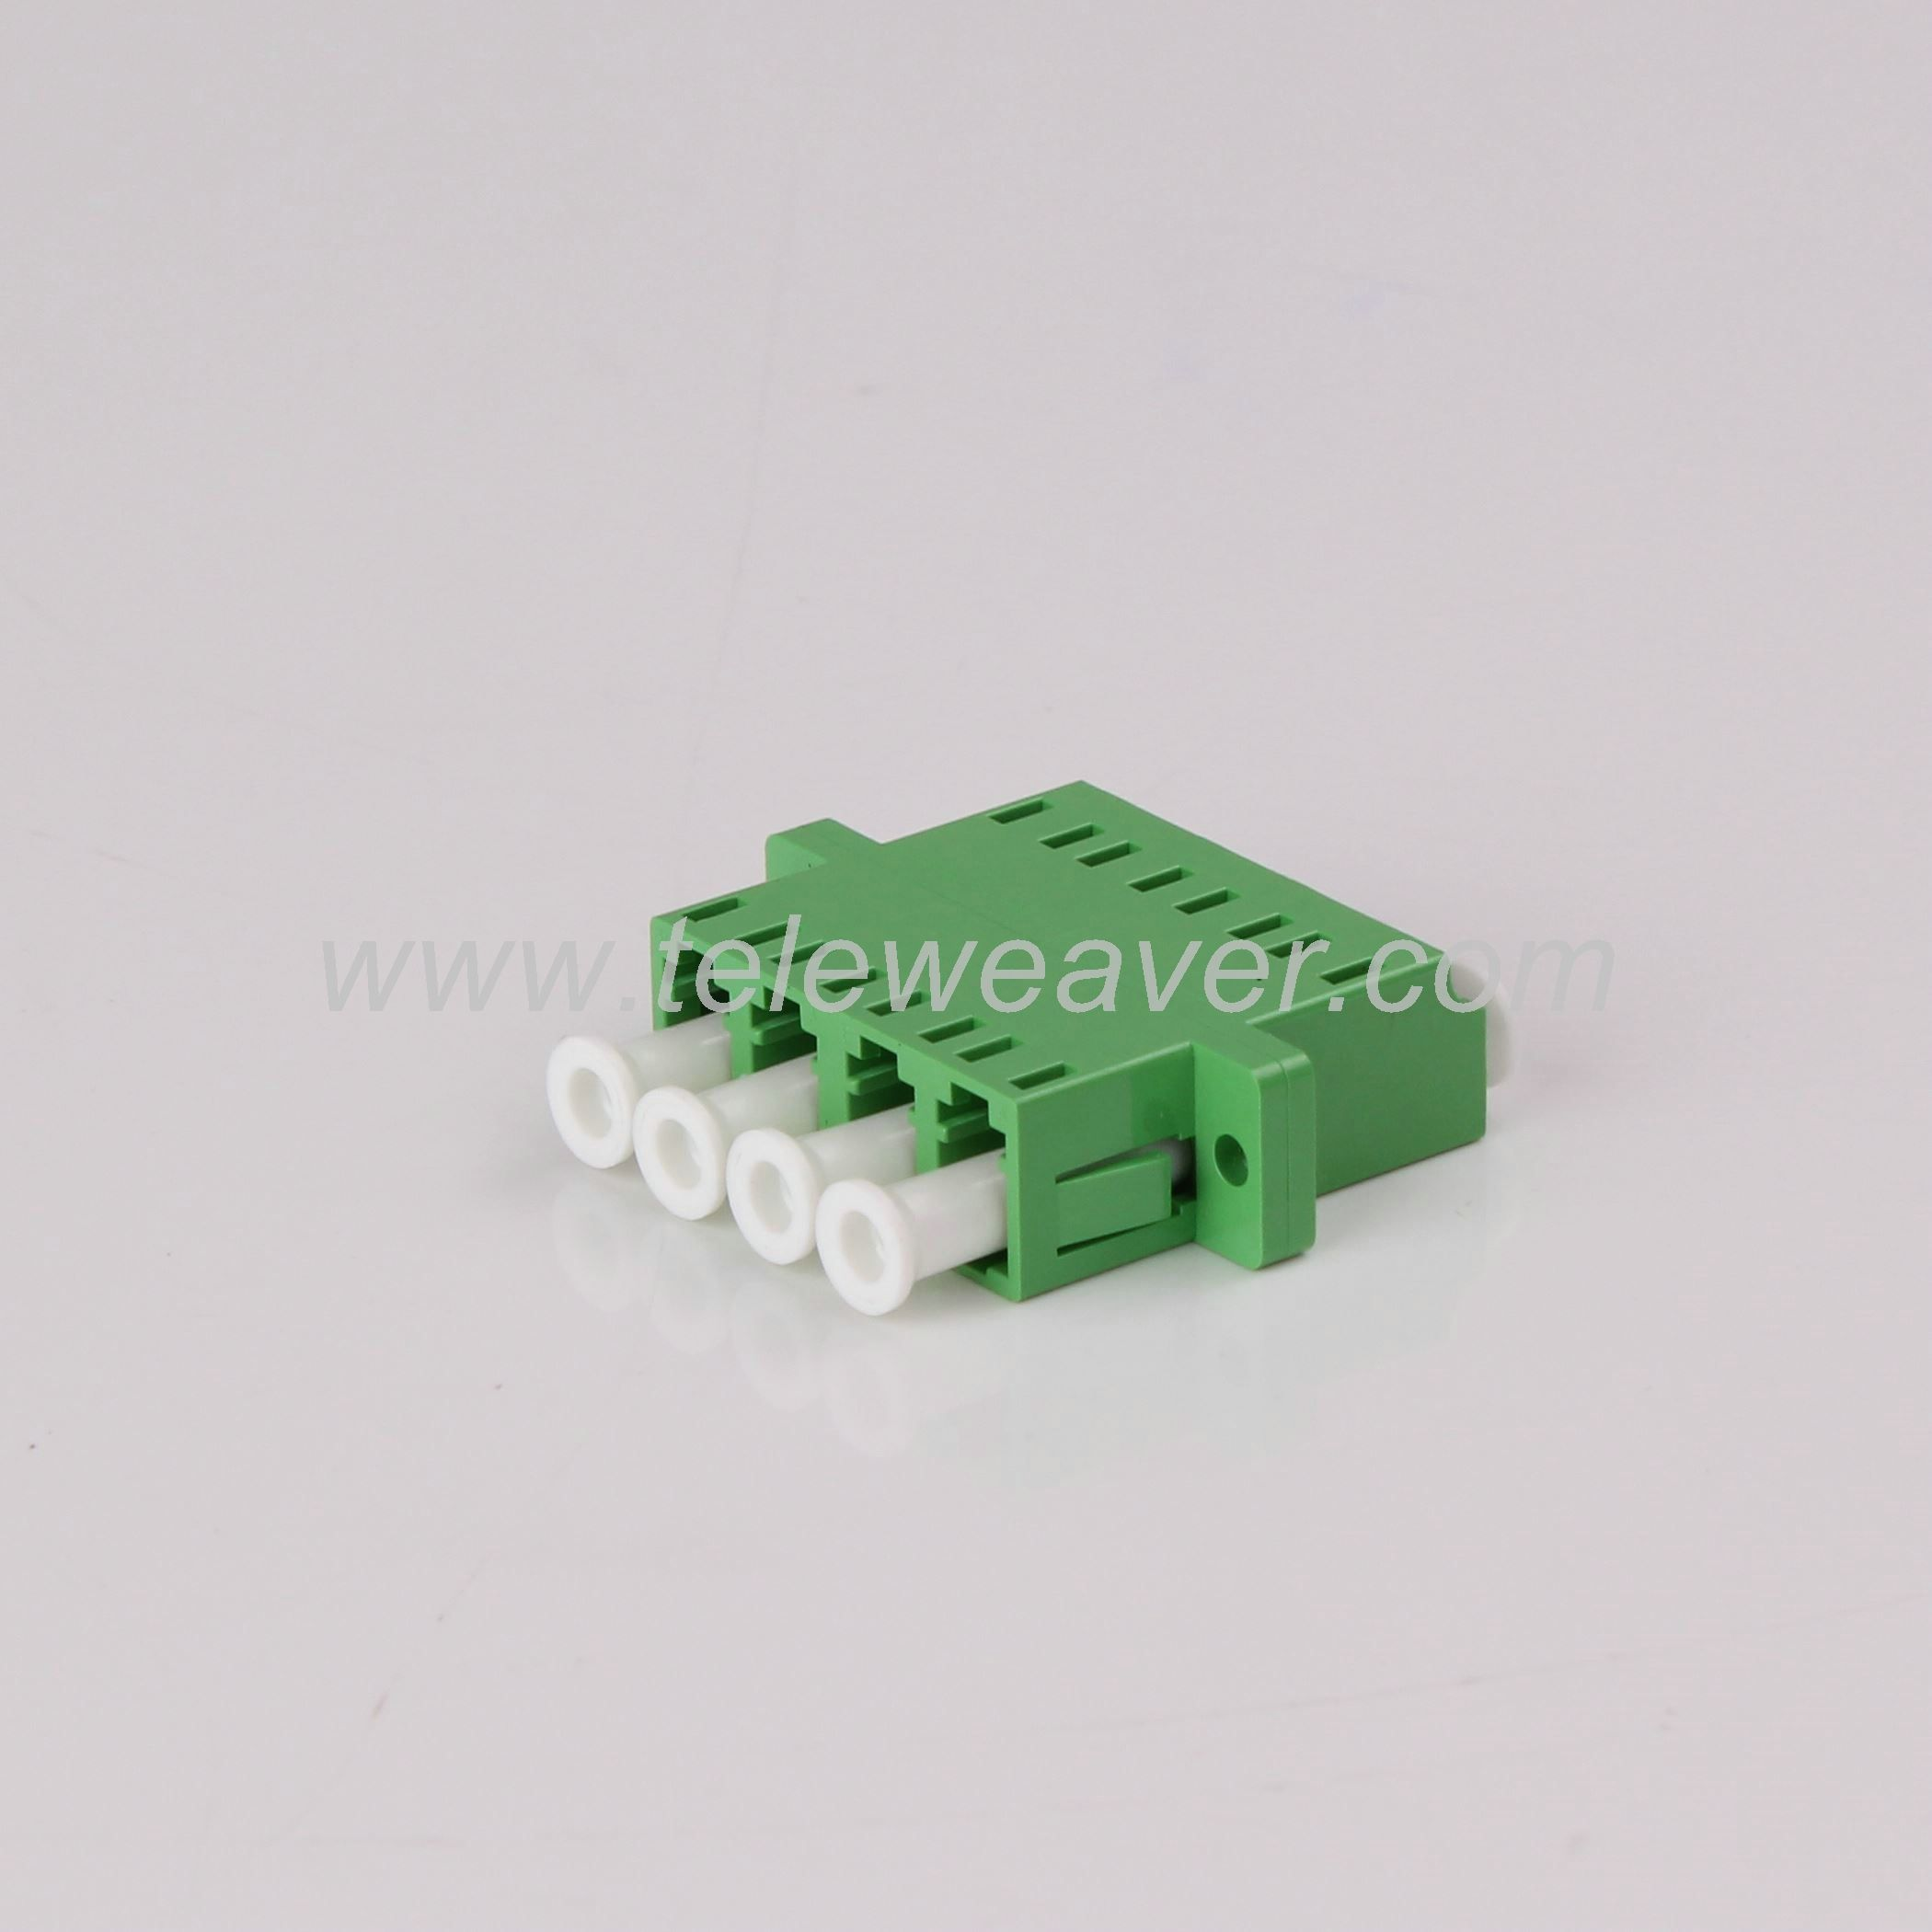 10pc SC APC SM Duplex Fiber Optic Adapter SC//APC Flange Coupler Adaptor